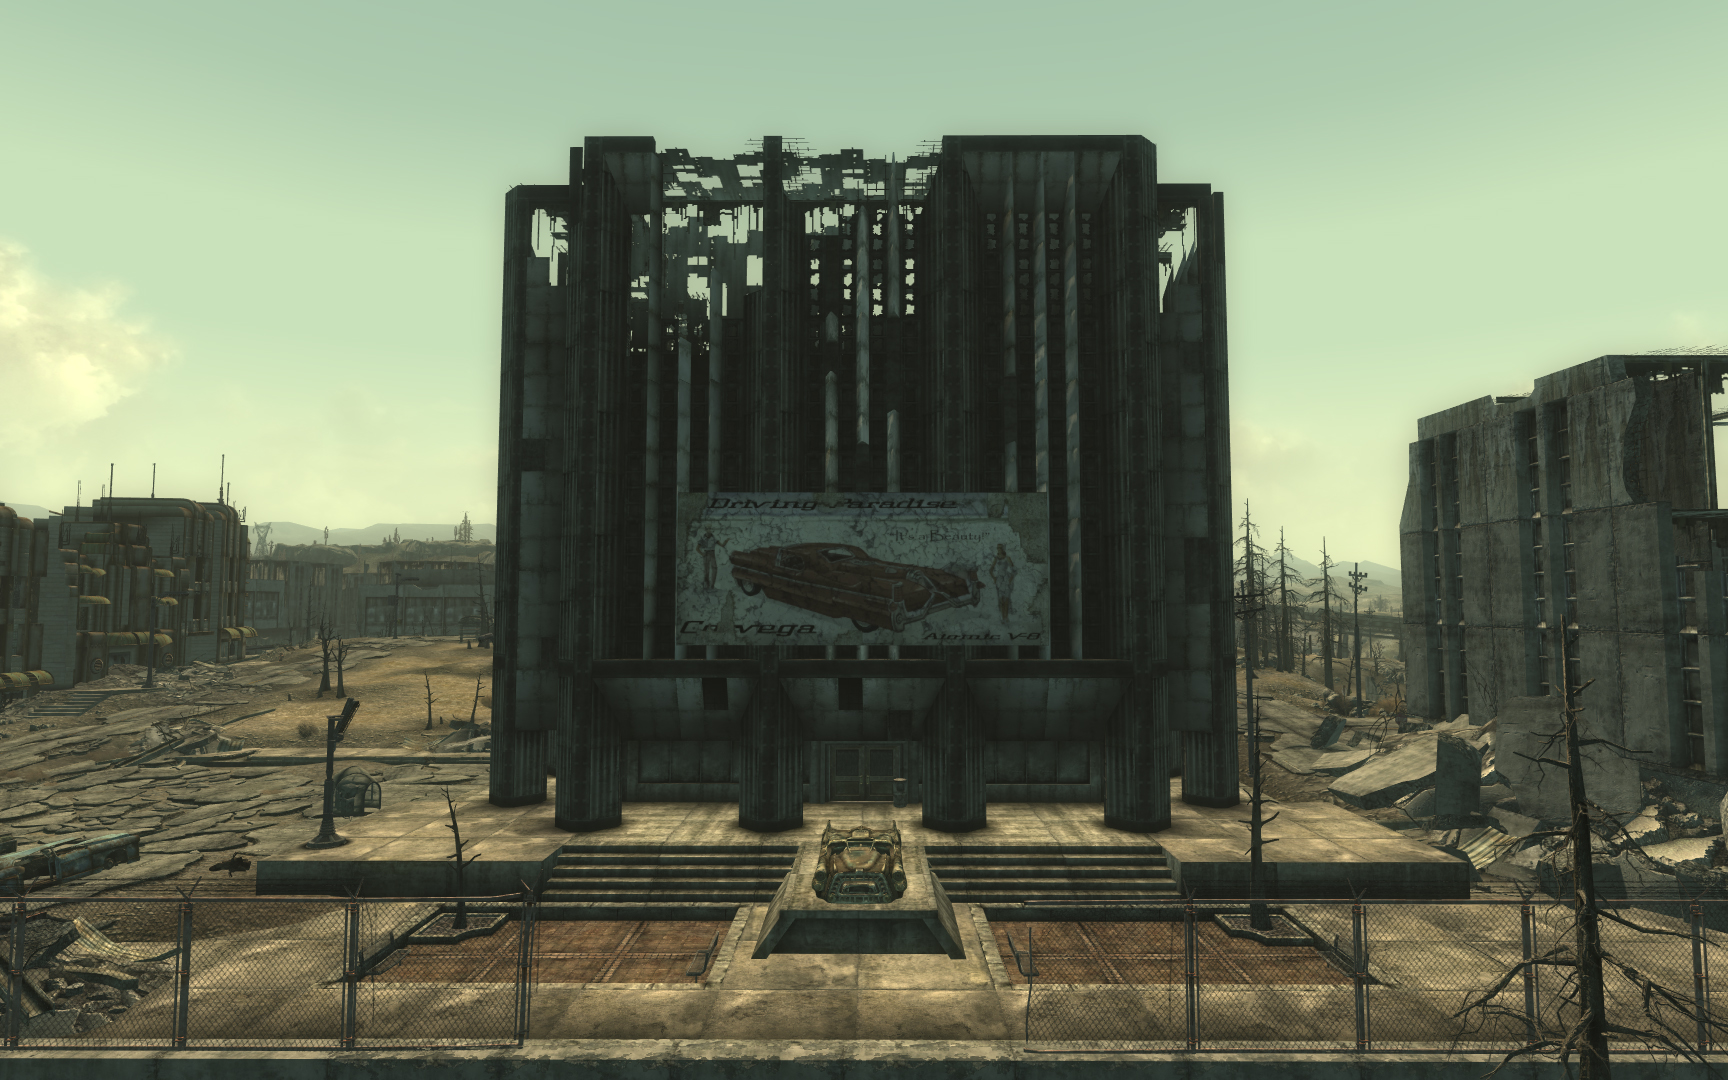 Billy Dunwich Building Fallout Wiki FANDOM powered - satukis.info on fallout 3 dunwich ruins, fallout journal, fallout 3 dunwich bobblehead, subway under capitol building, fallout 3 chryslus building, fallout dunwich horror,